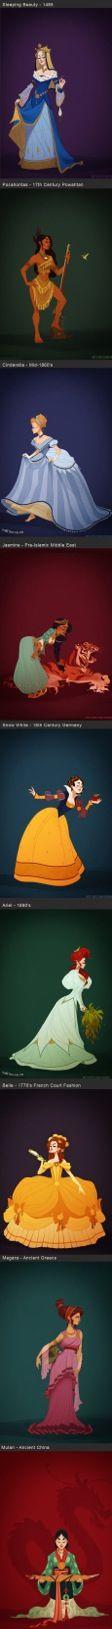 Disney princesses in accurate period costume.